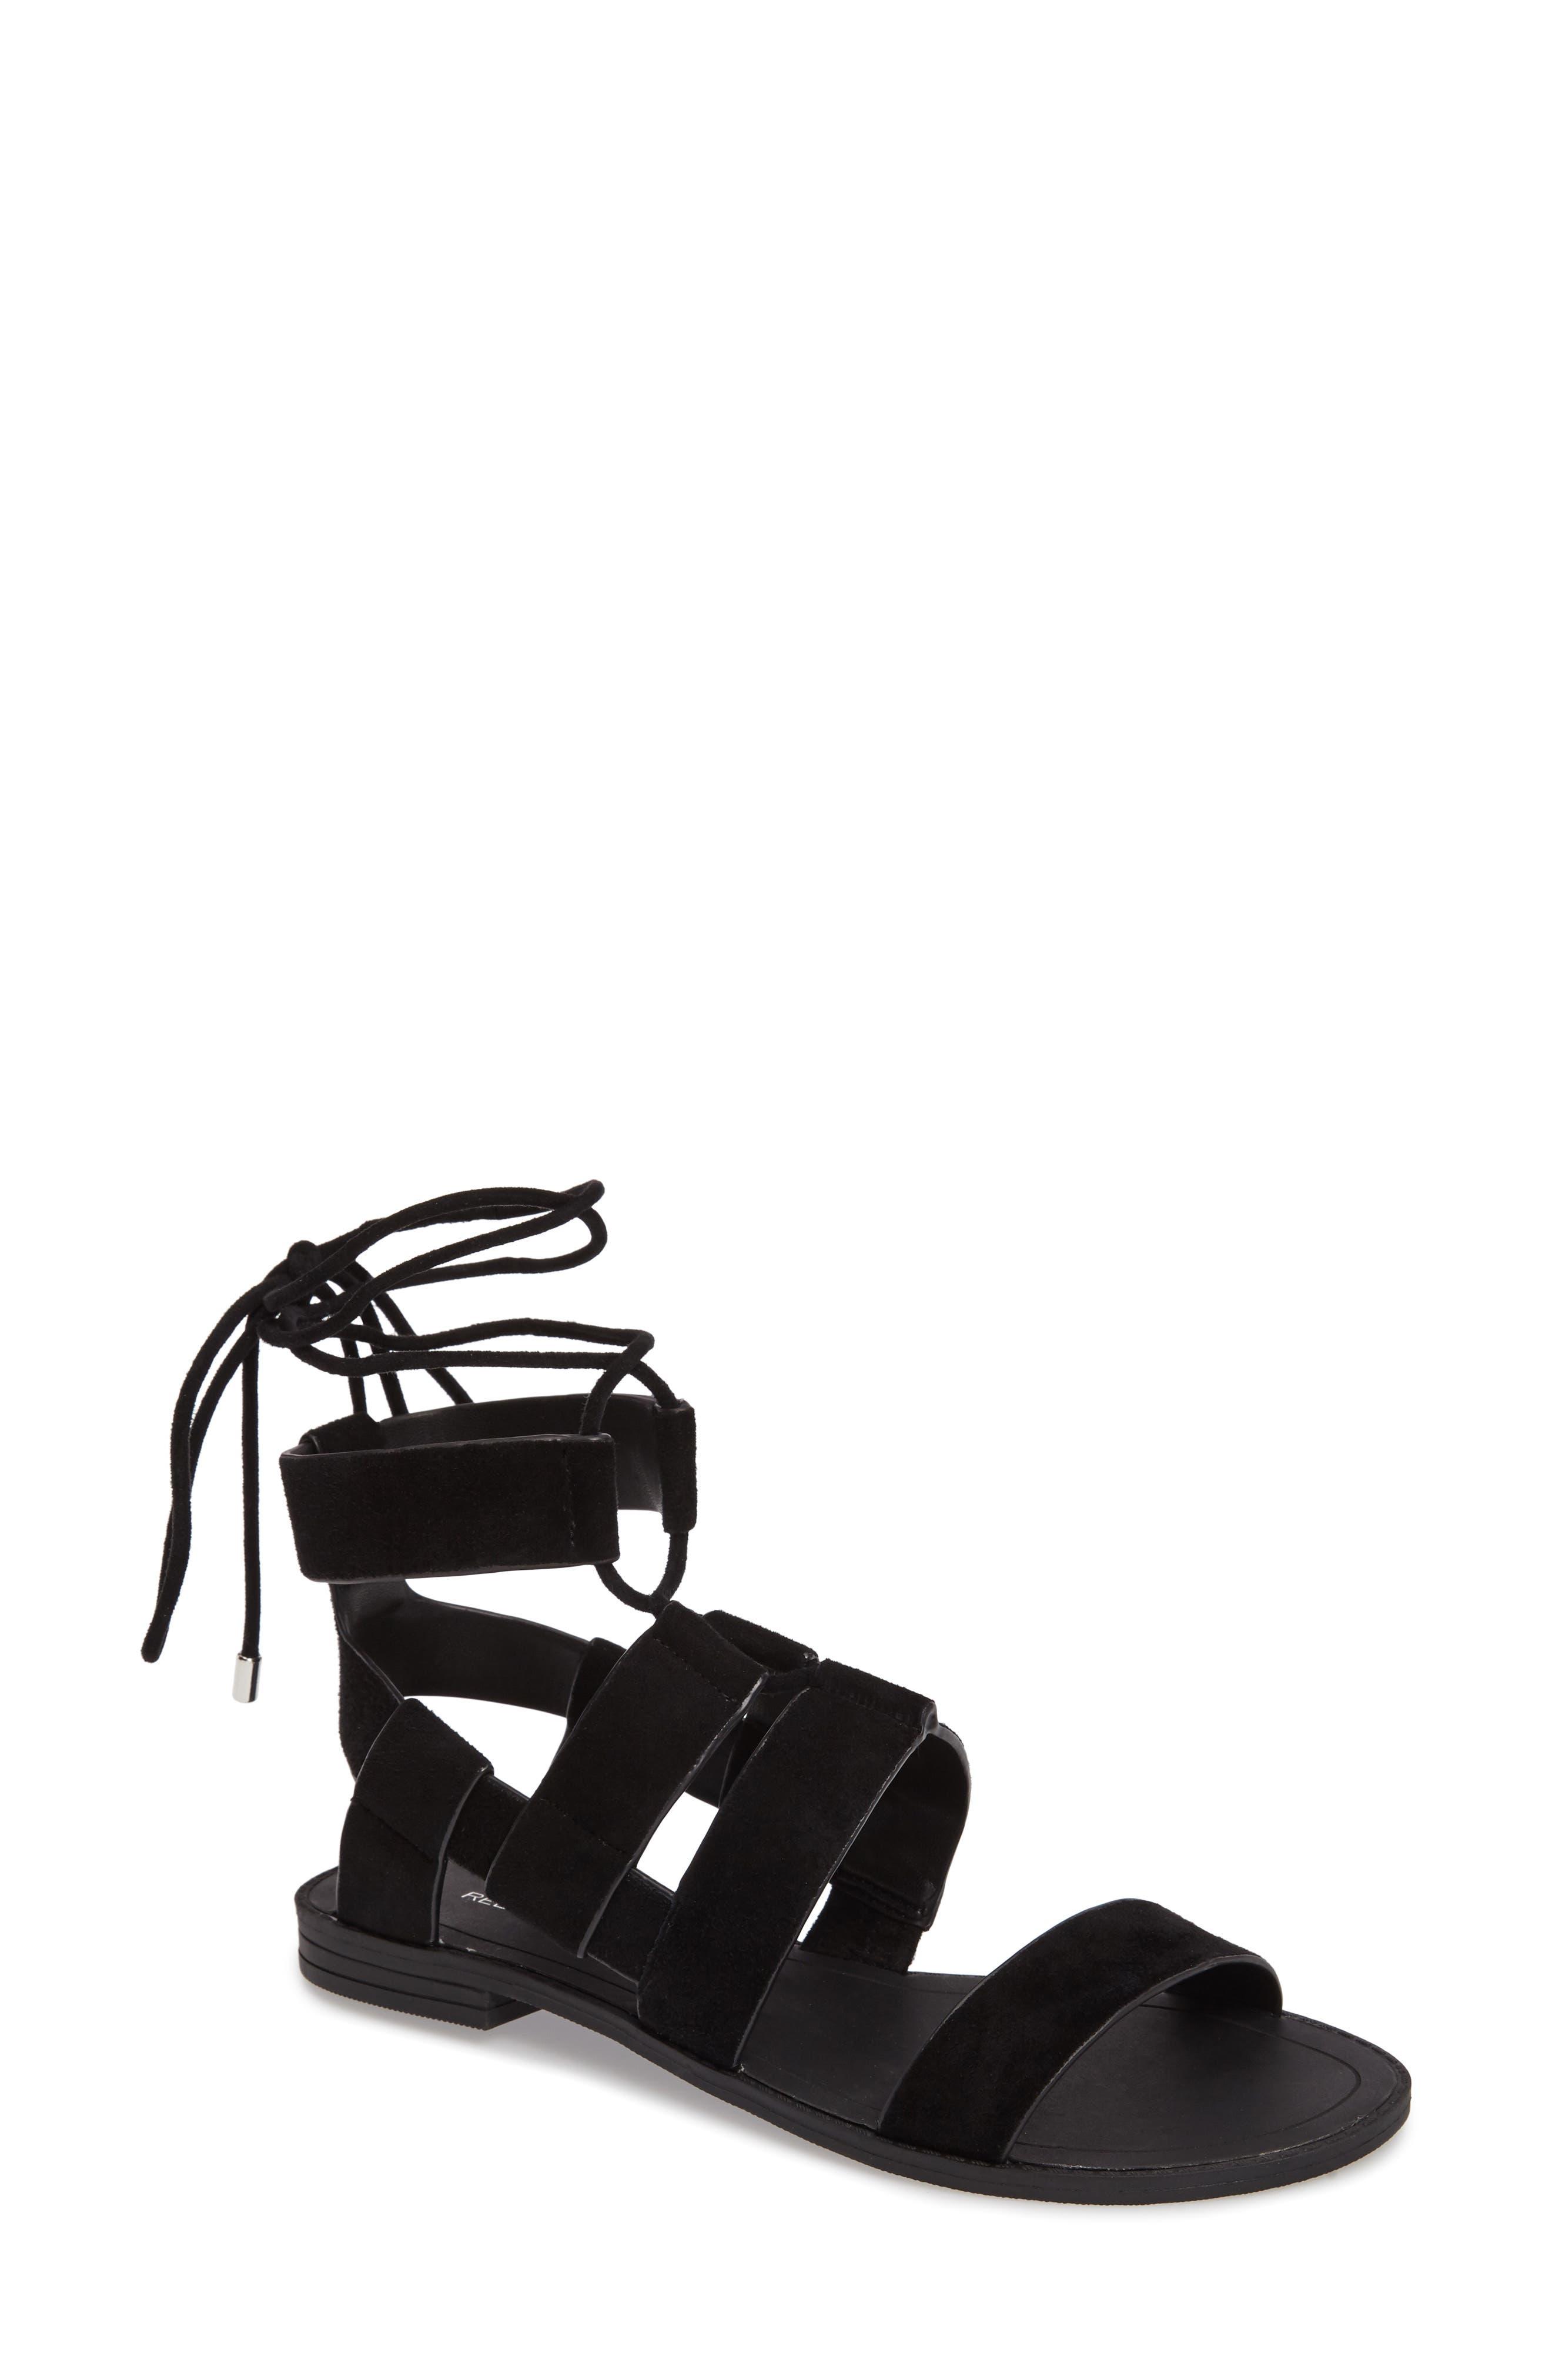 Giada Strappy Sandal,                             Main thumbnail 1, color,                             001